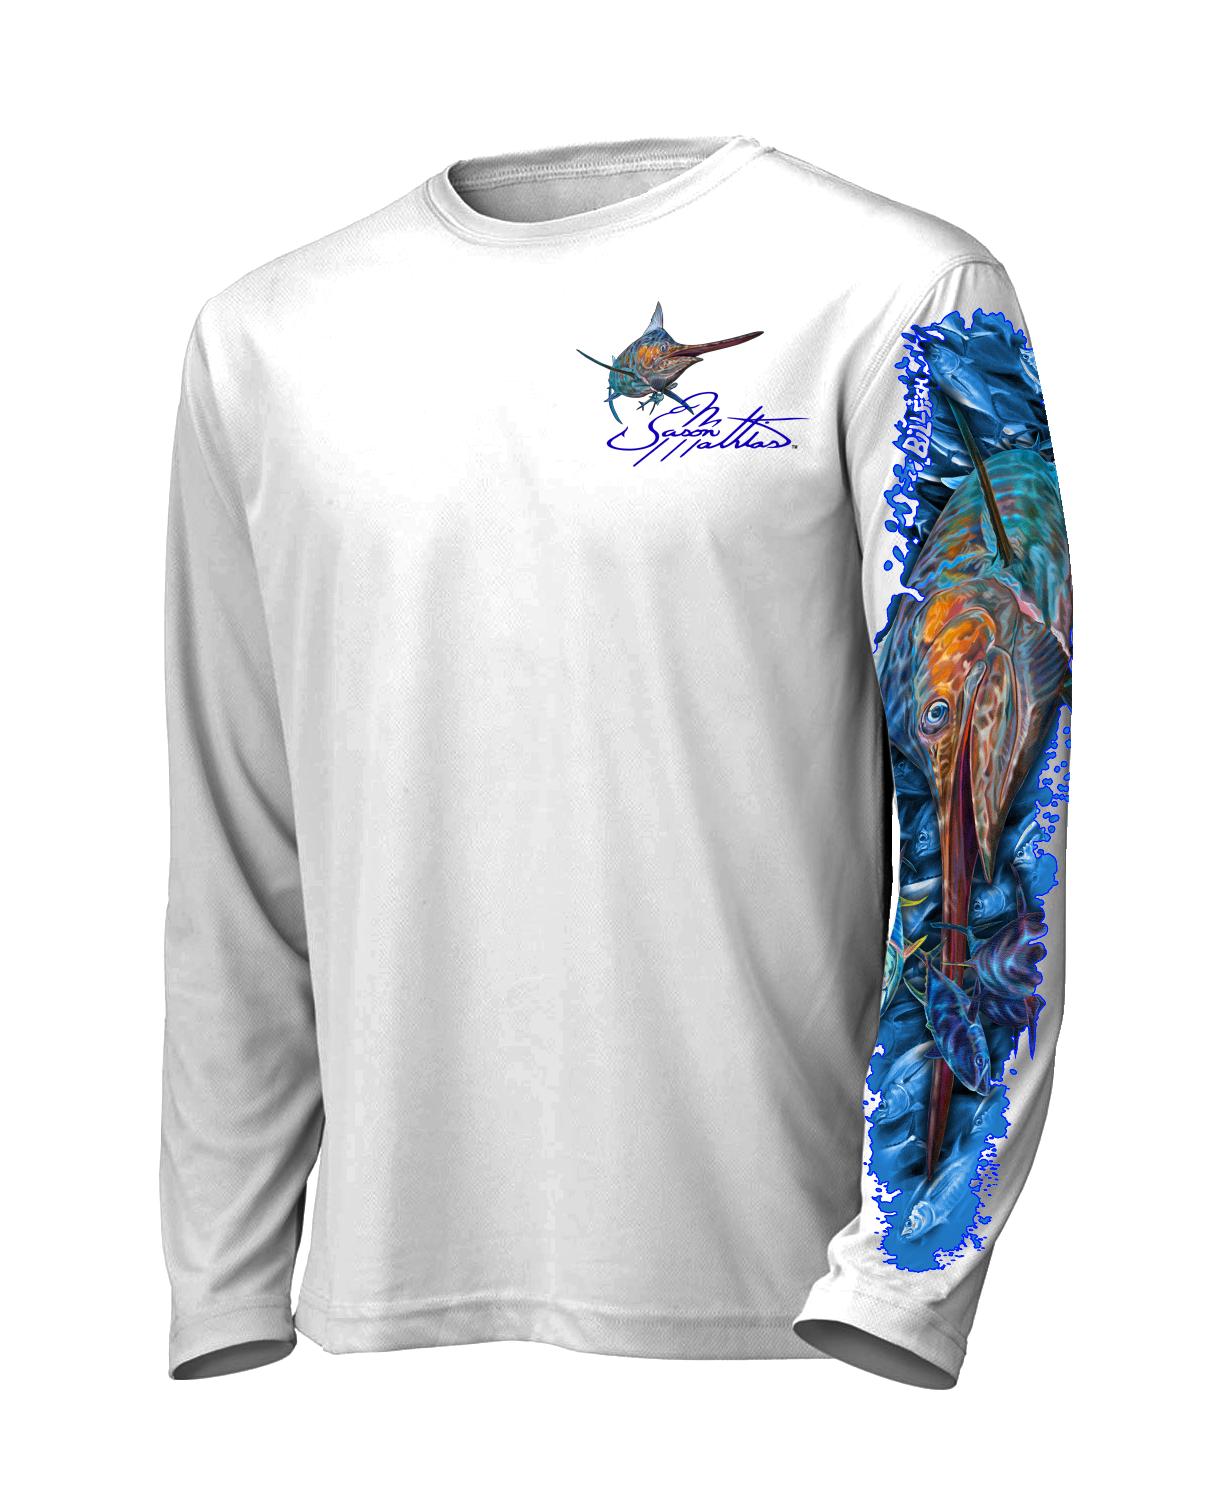 marlin-sailfish-white-front-shirt-jason-mathias-apparel-gear-fishing-gamefish-art-sportfish-art-tee-shirt-t-shirt-clothing.png